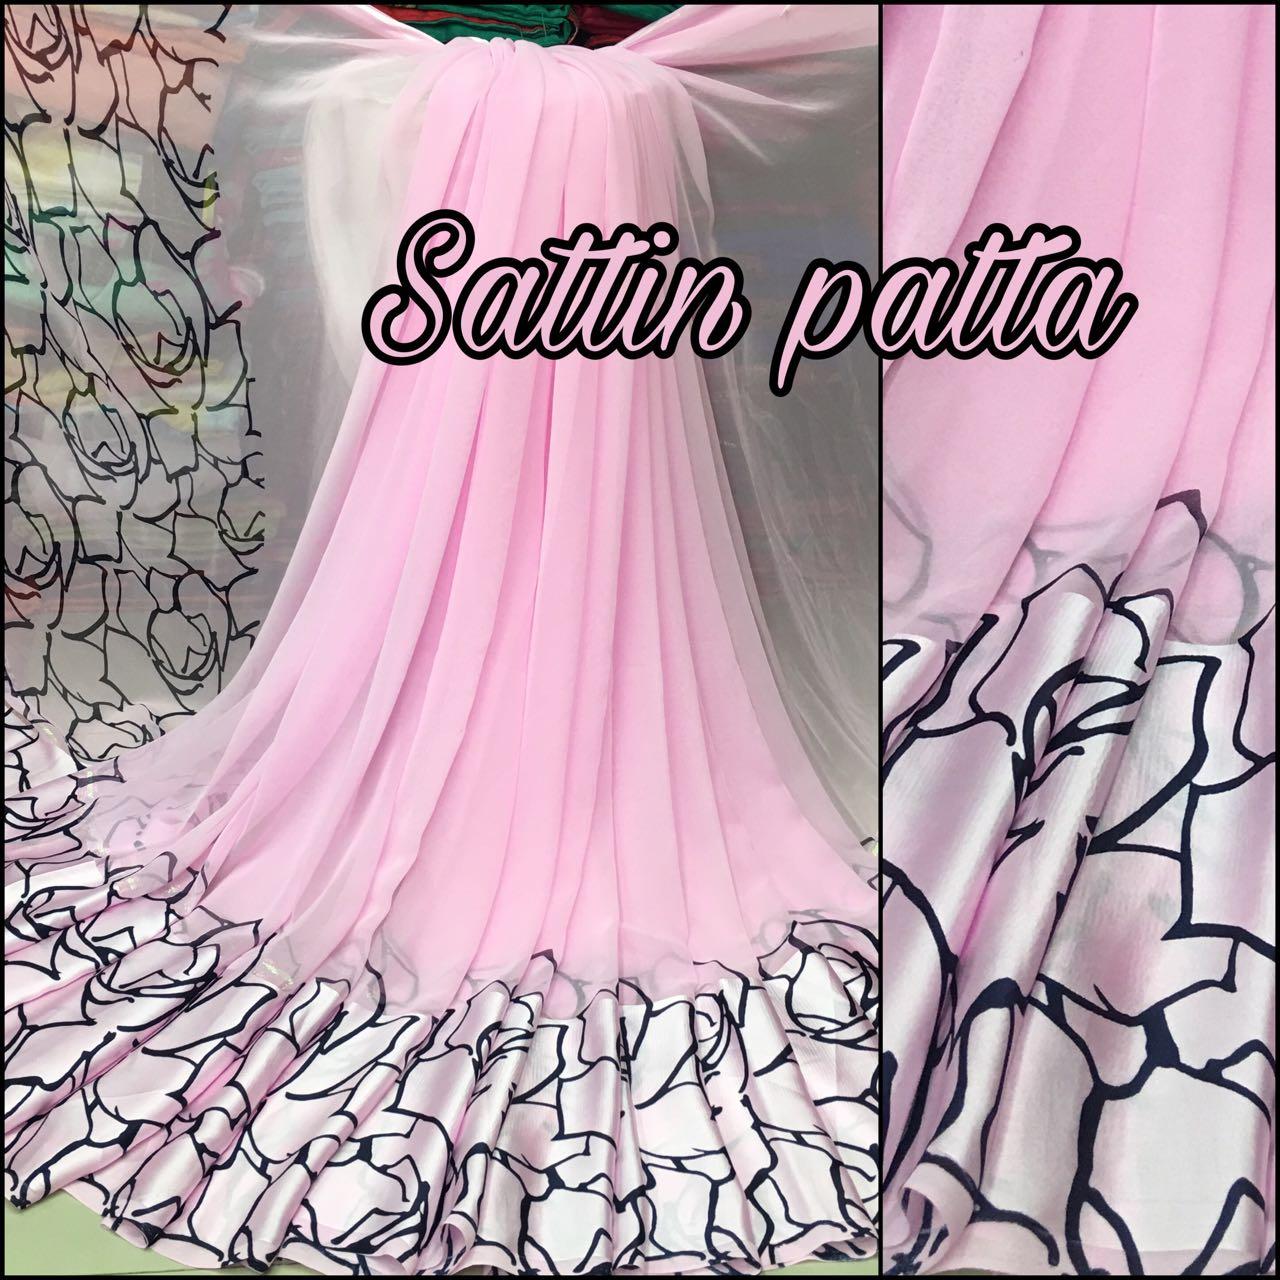 b7d348f645 Pleasant Pink Designer Printed Georgette Satin Patta Saree - SPPNK2